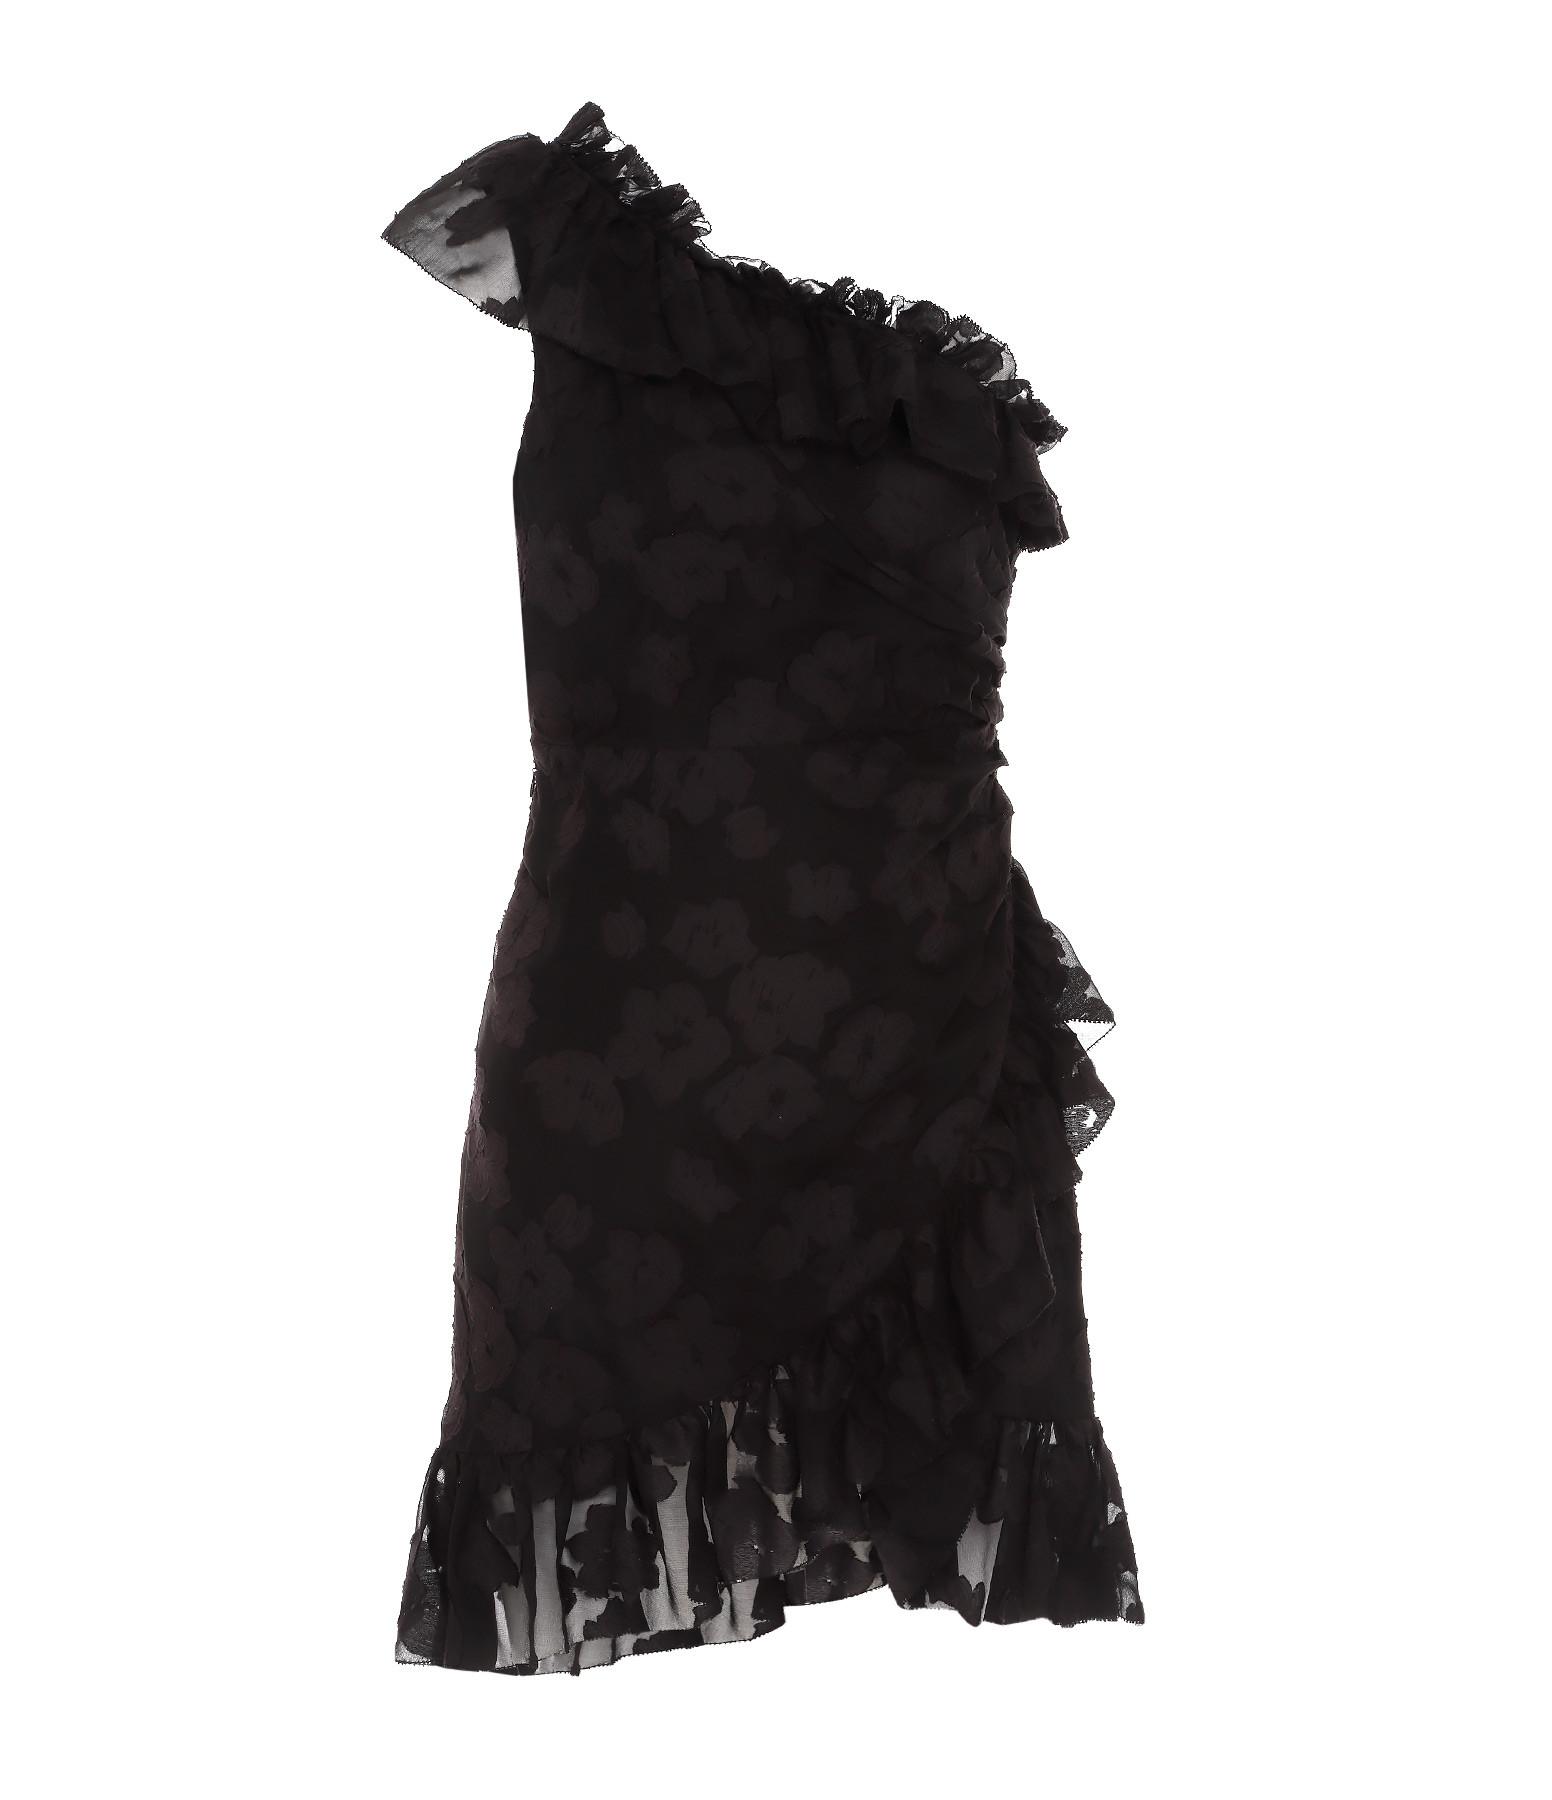 ULLA JOHNSON - Robe Tapestry Rimona Soie Coton Noir